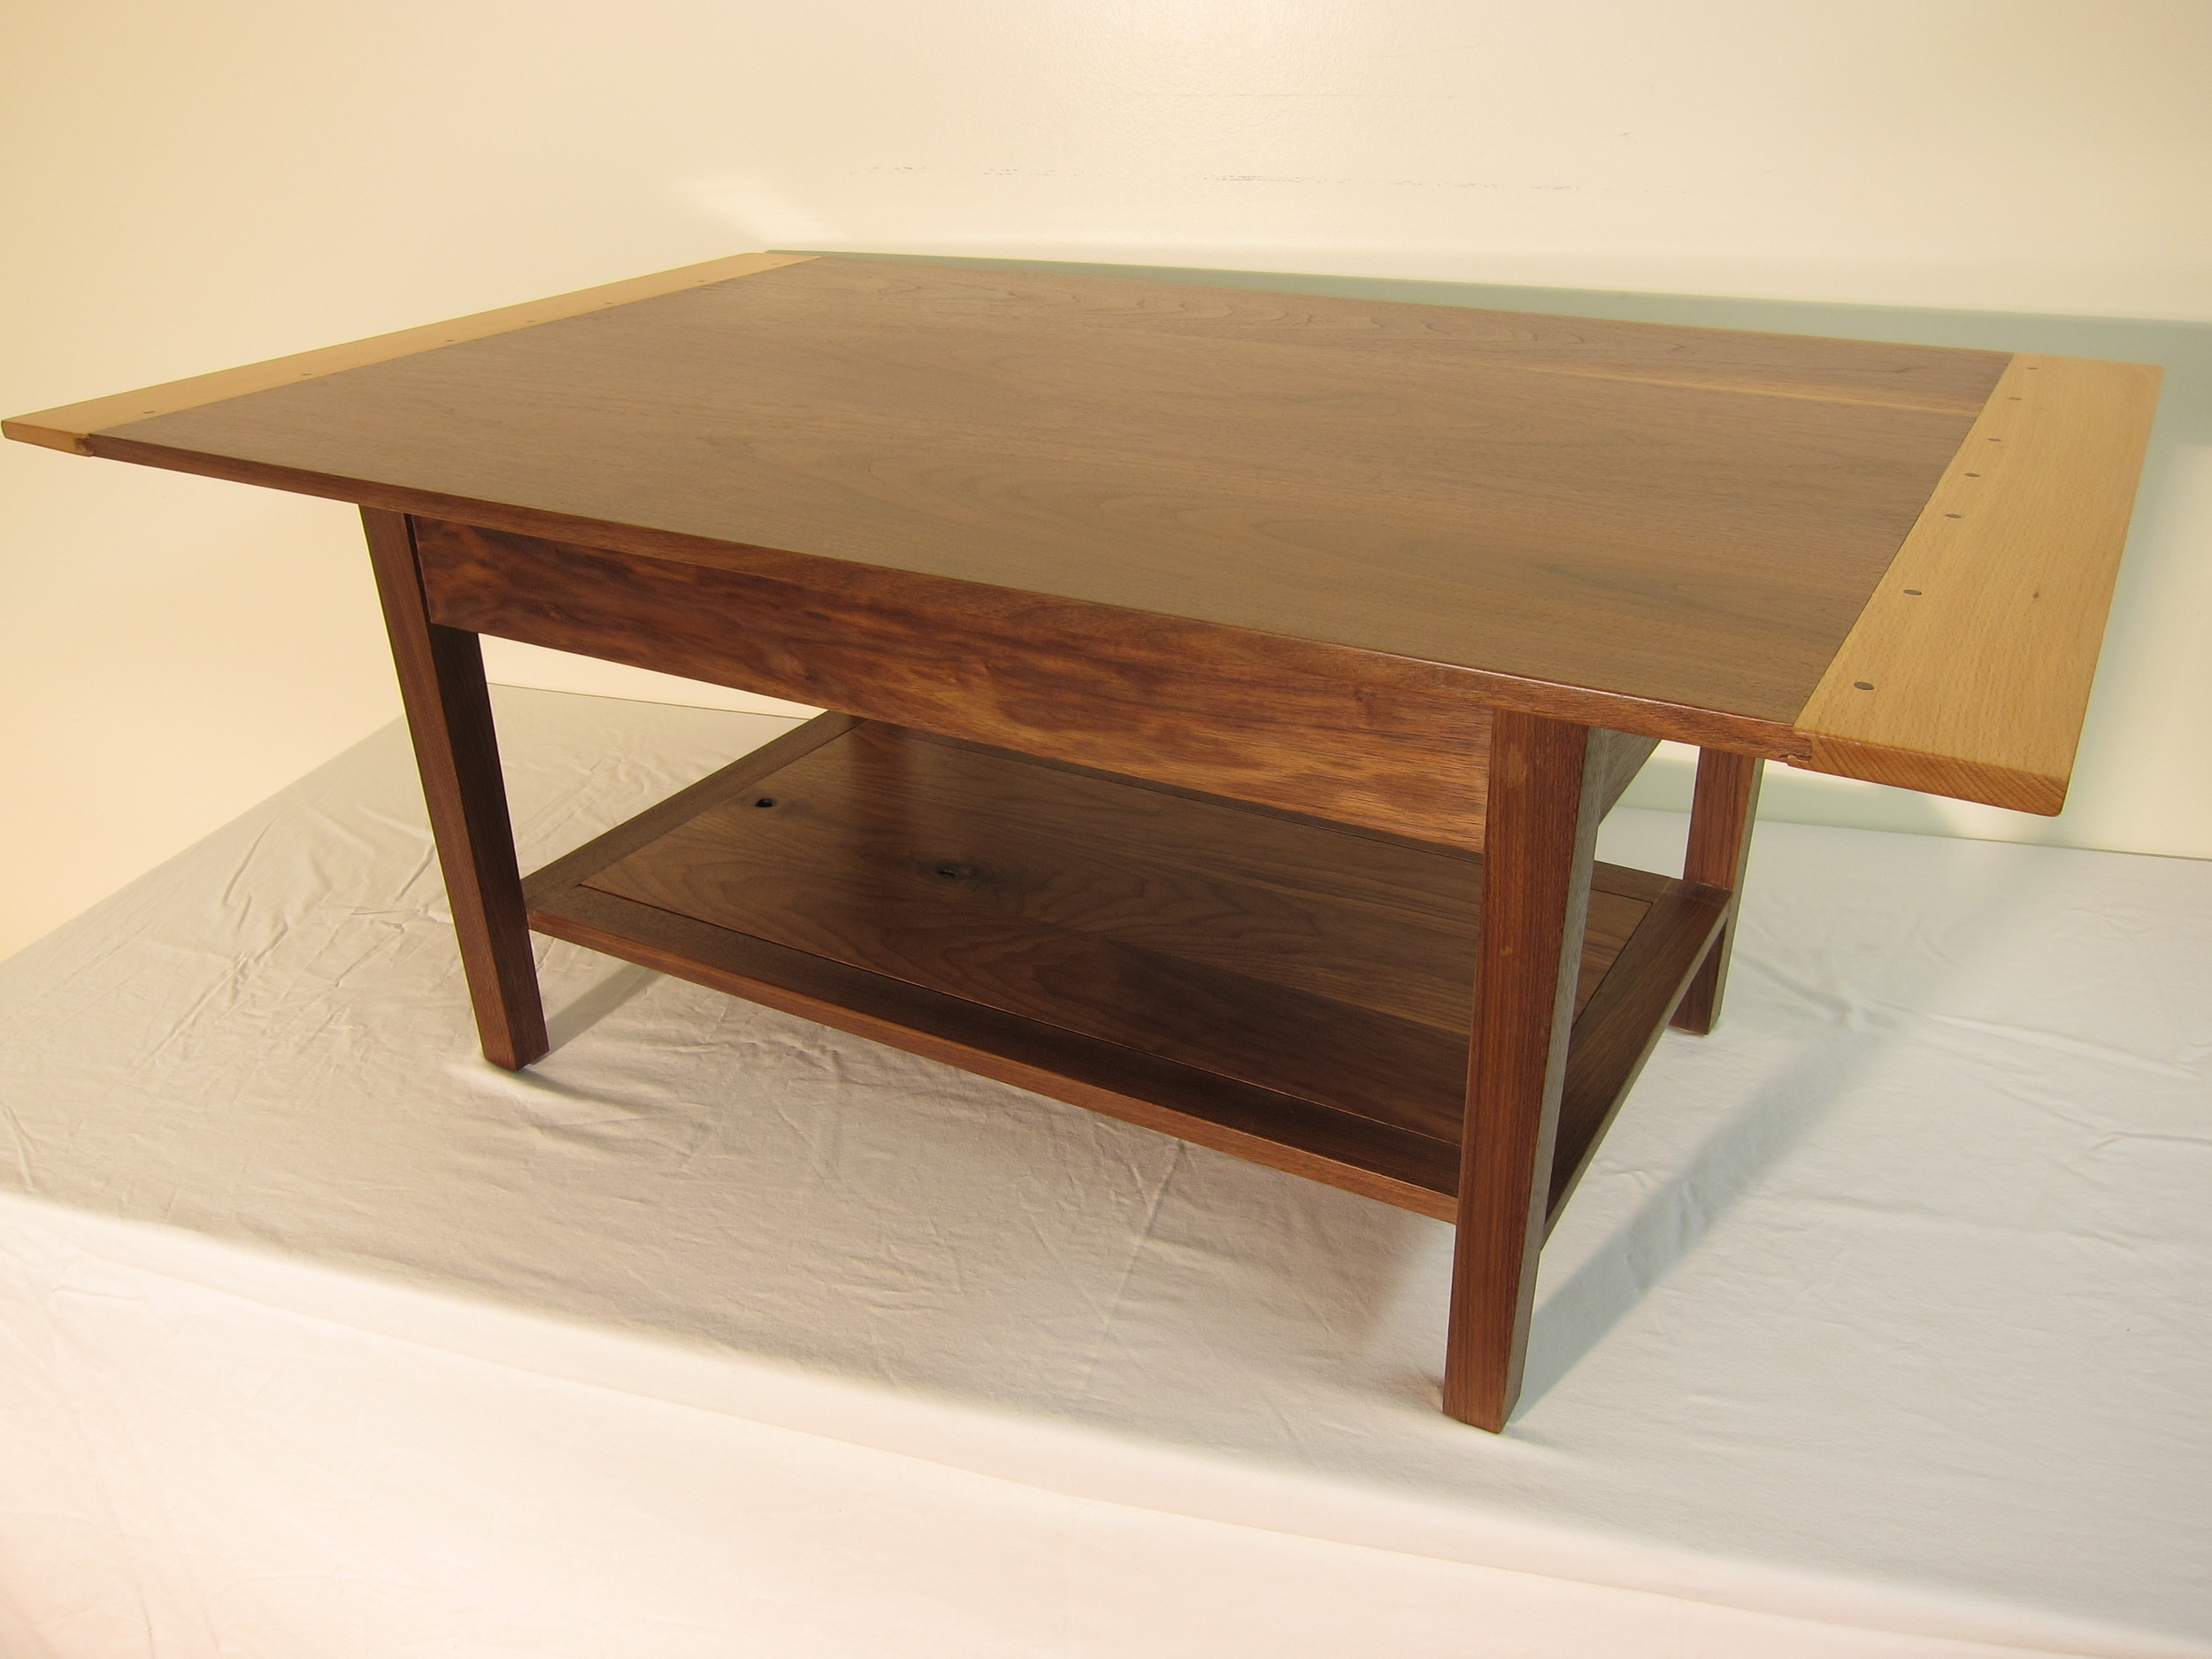 Johnny_A_Williams_Stuart_Road_Coffee_Table_1.JPG